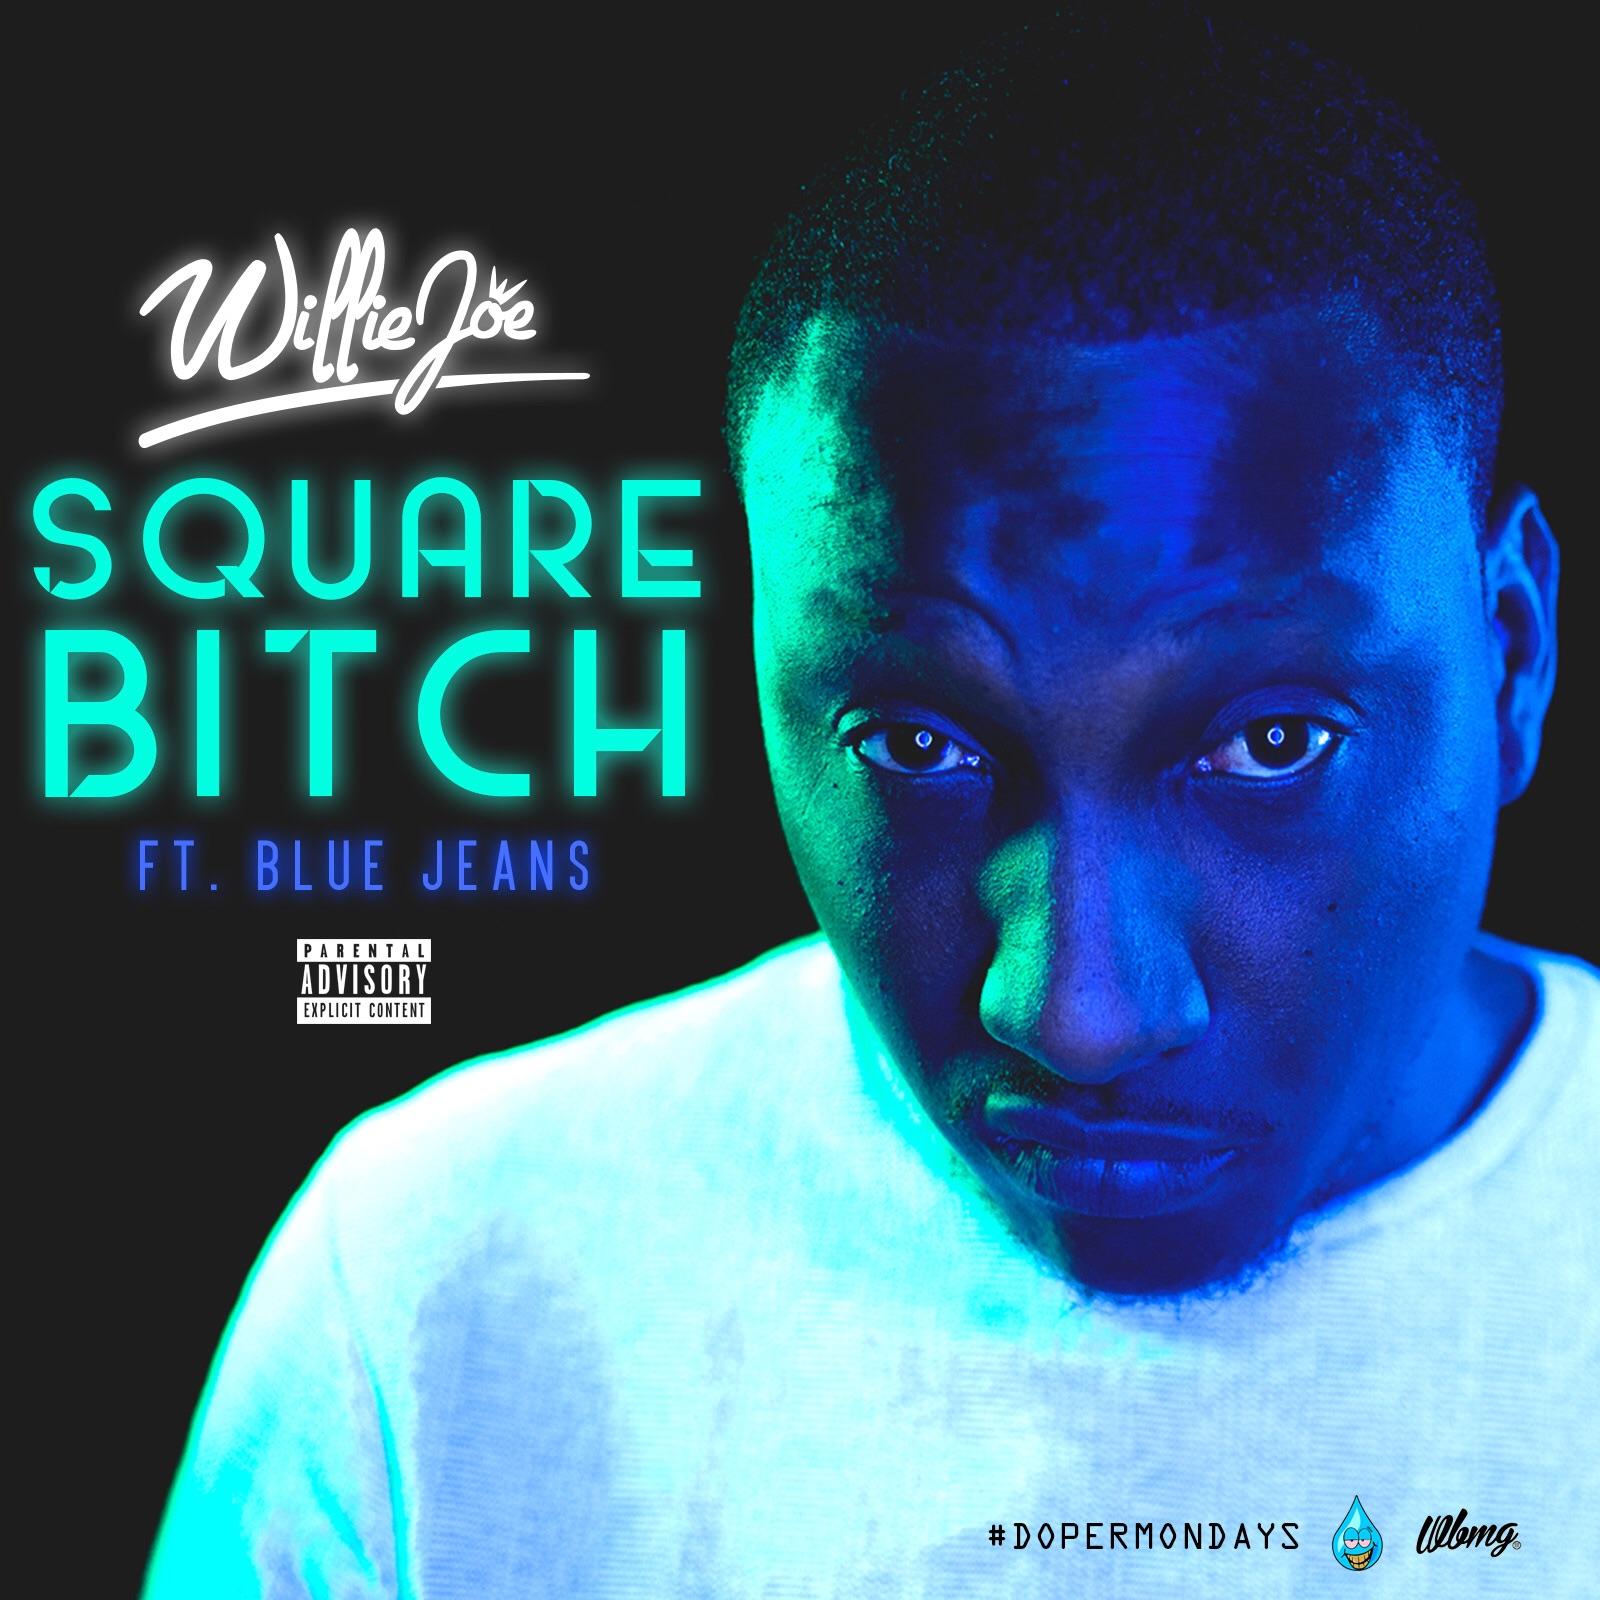 willie-joe-square-bitch